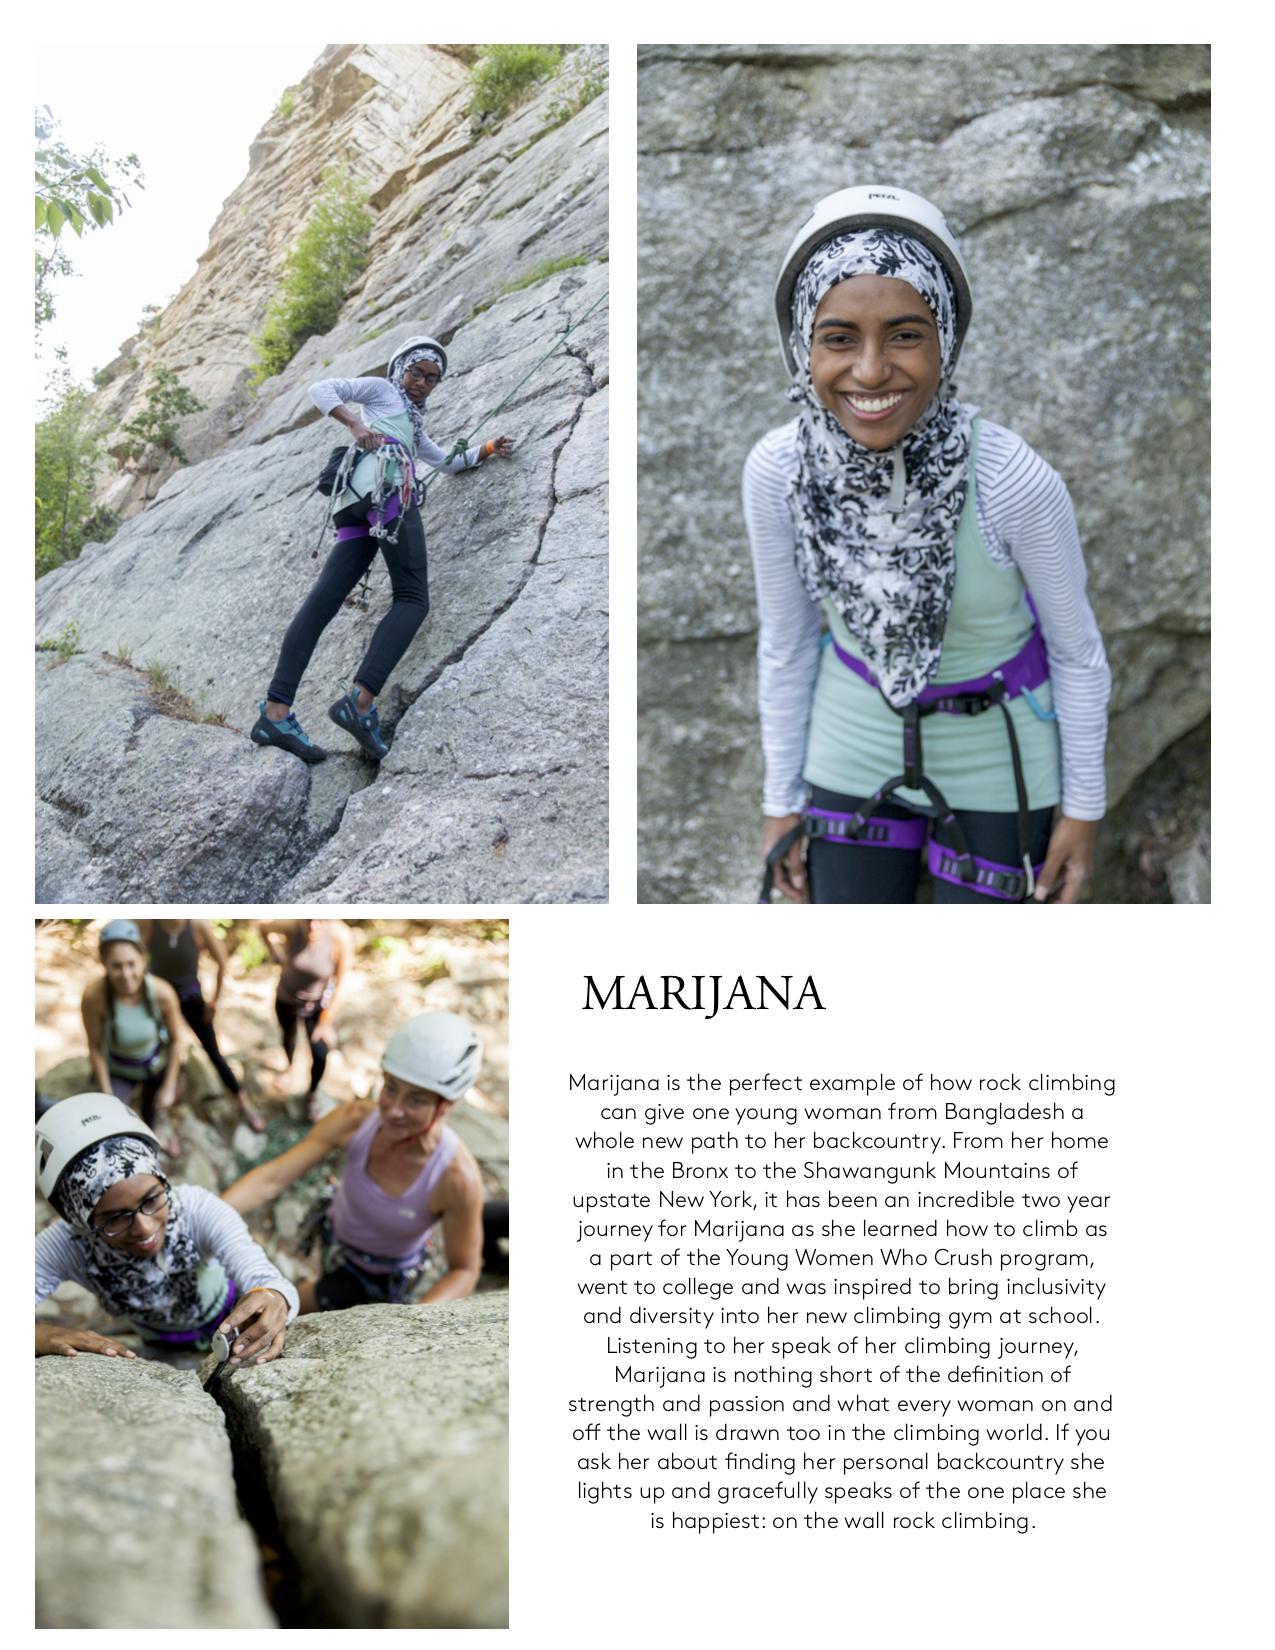 Backcountry+DO Womens Climbing content assets_pg2.jpg